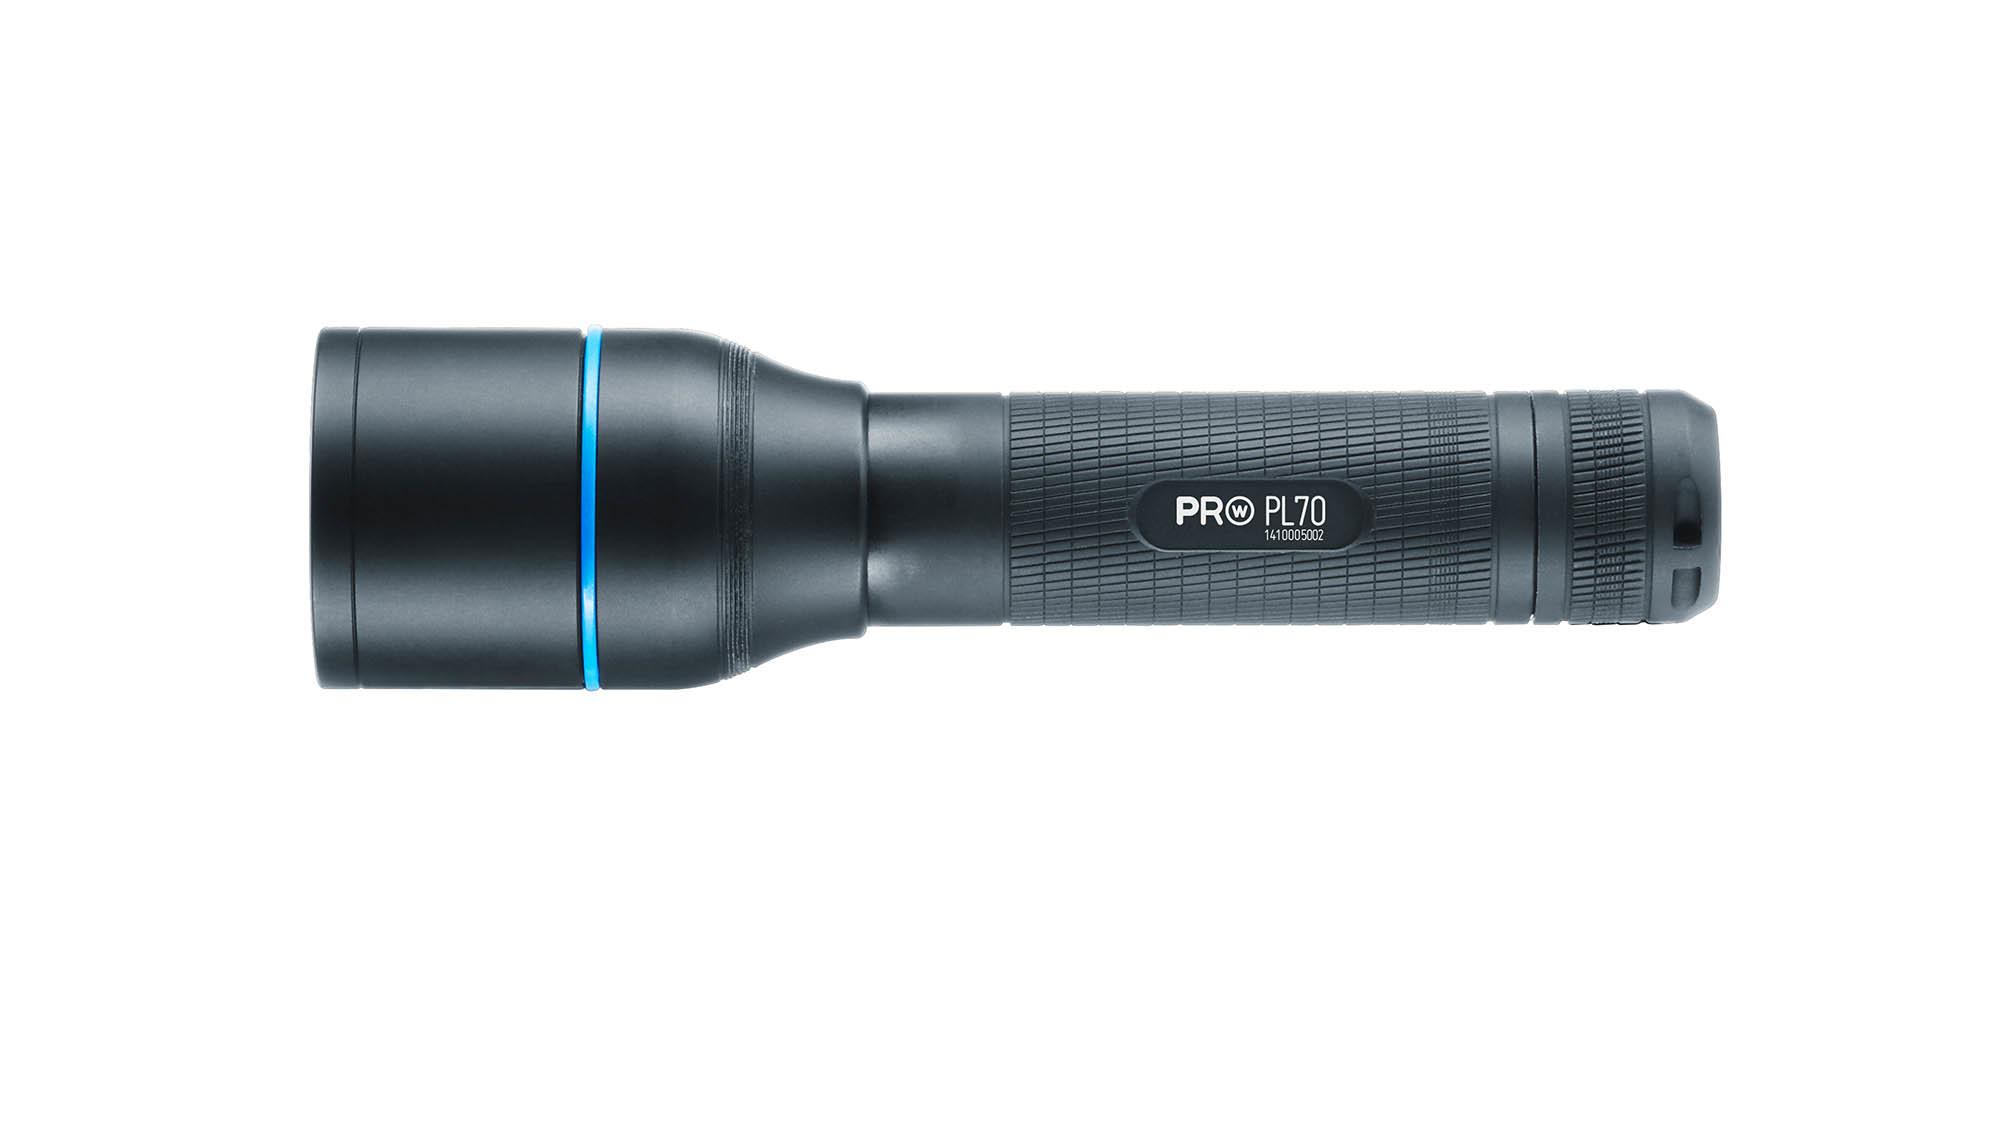 Walther PRO PL70 Taschenlampe